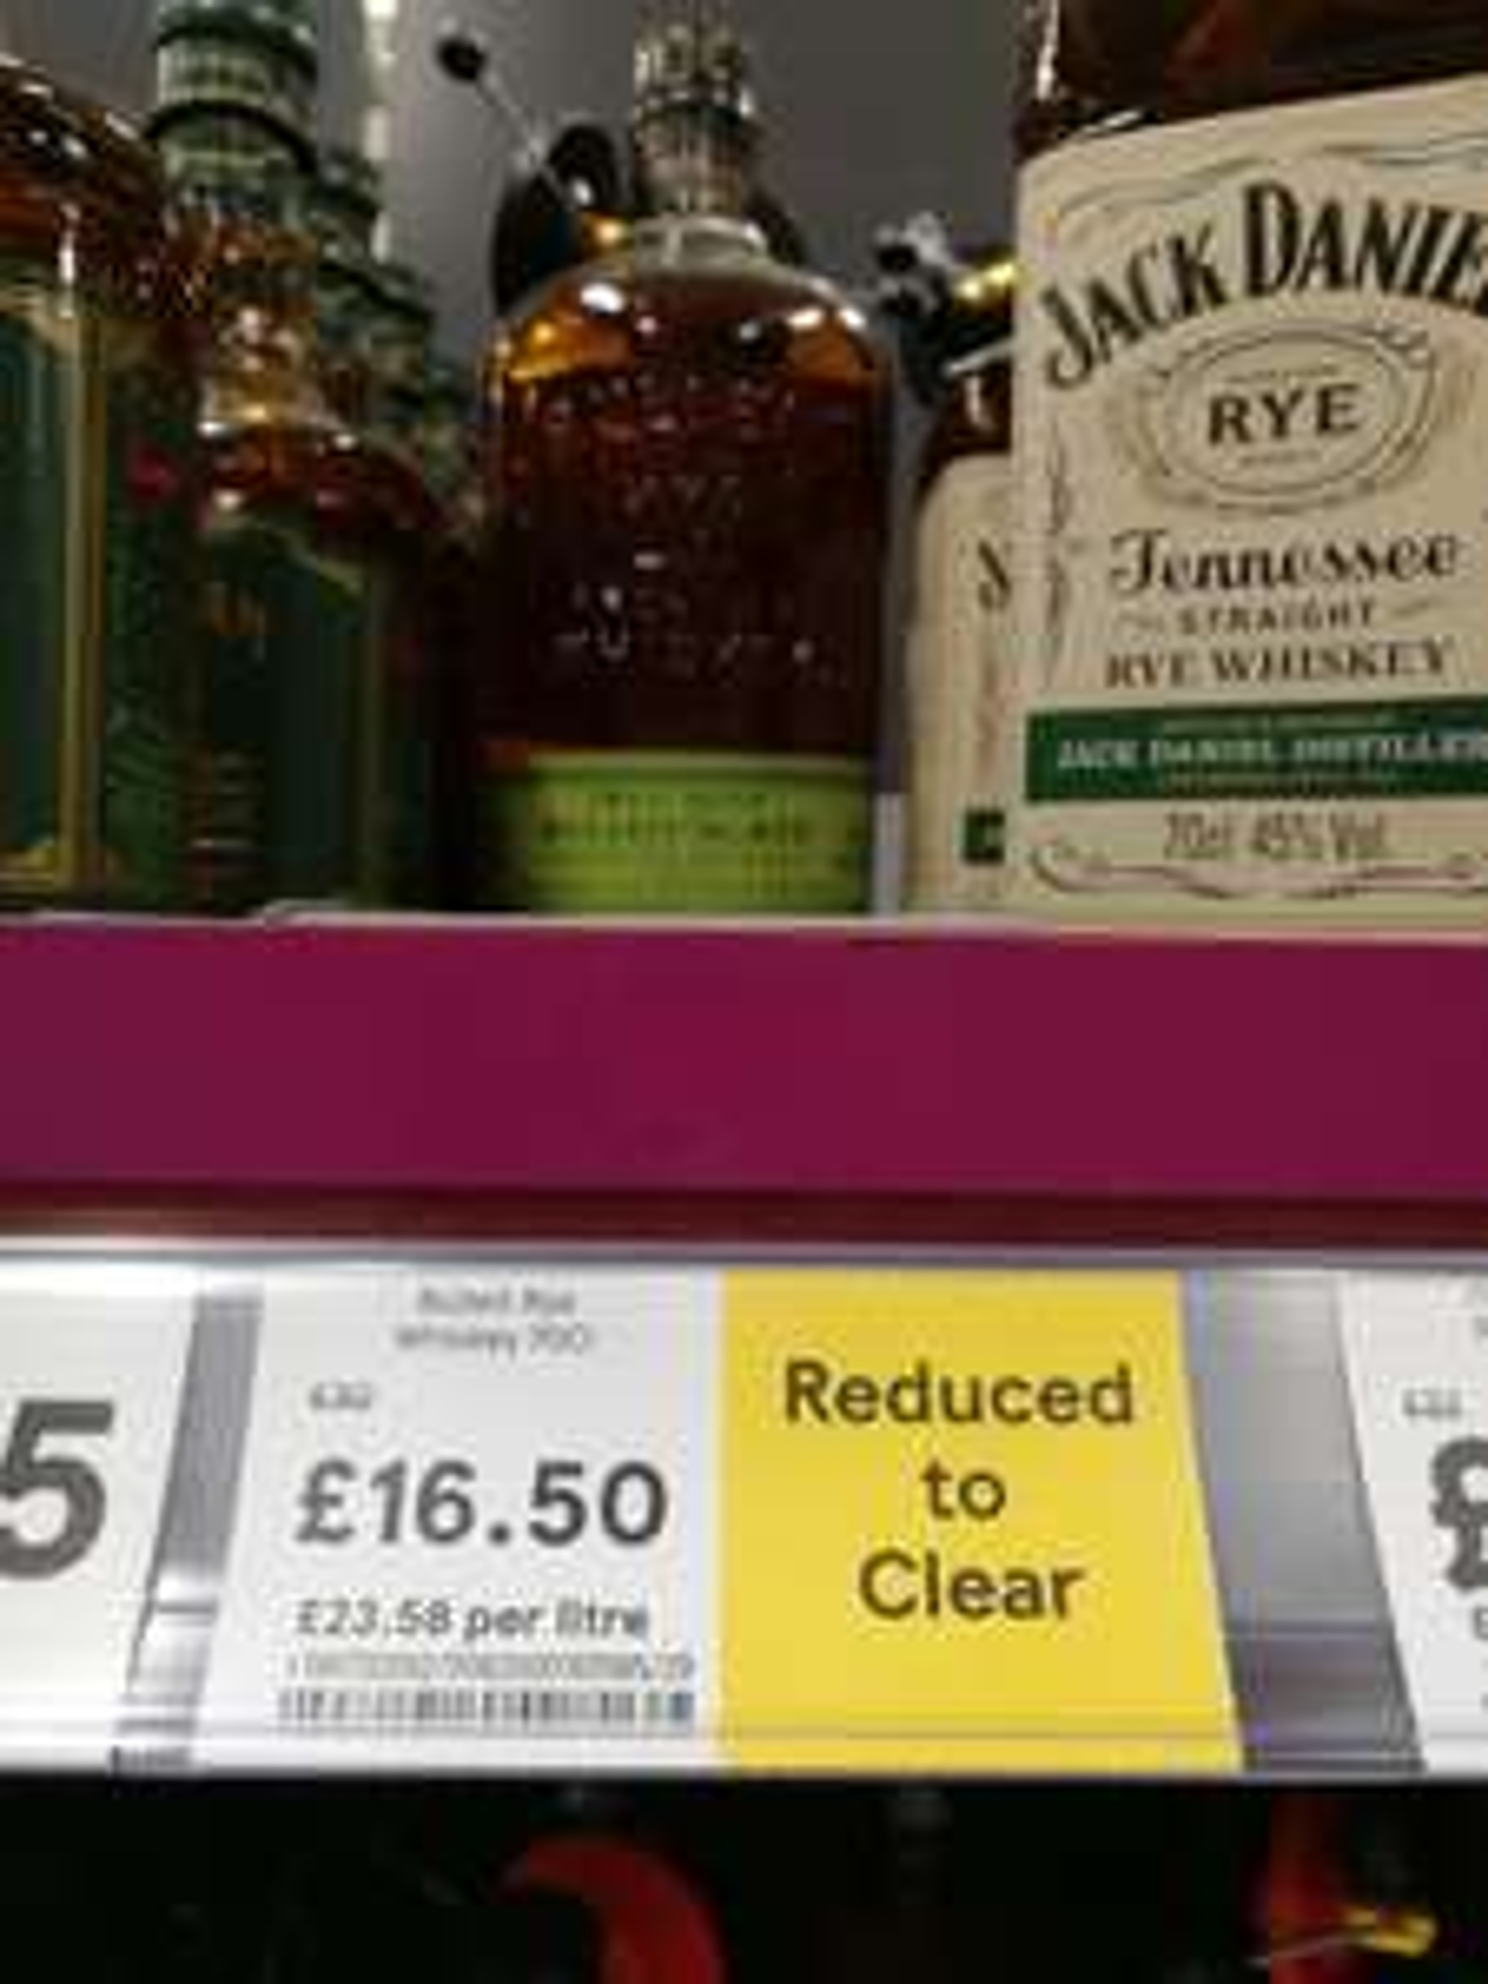 Bulleit rye whiskey 70cl - Tesco - Alfreton - £16.50